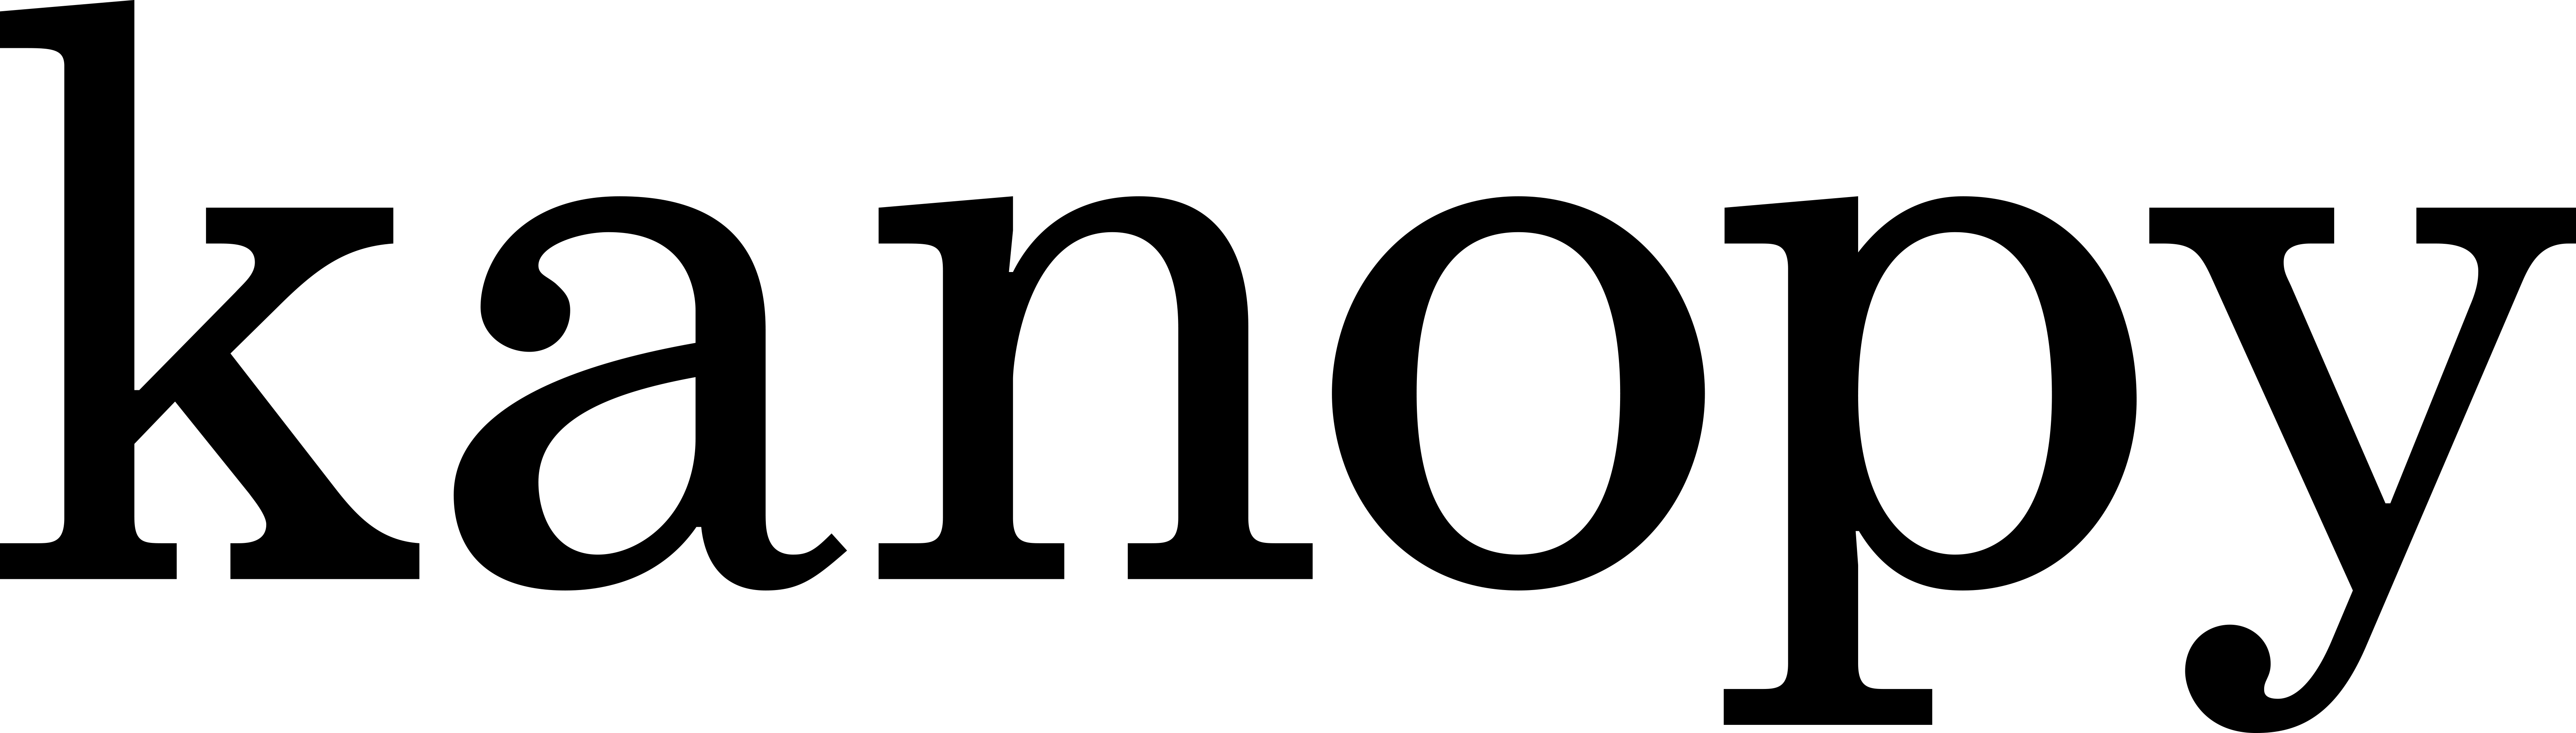 kanopy logo black